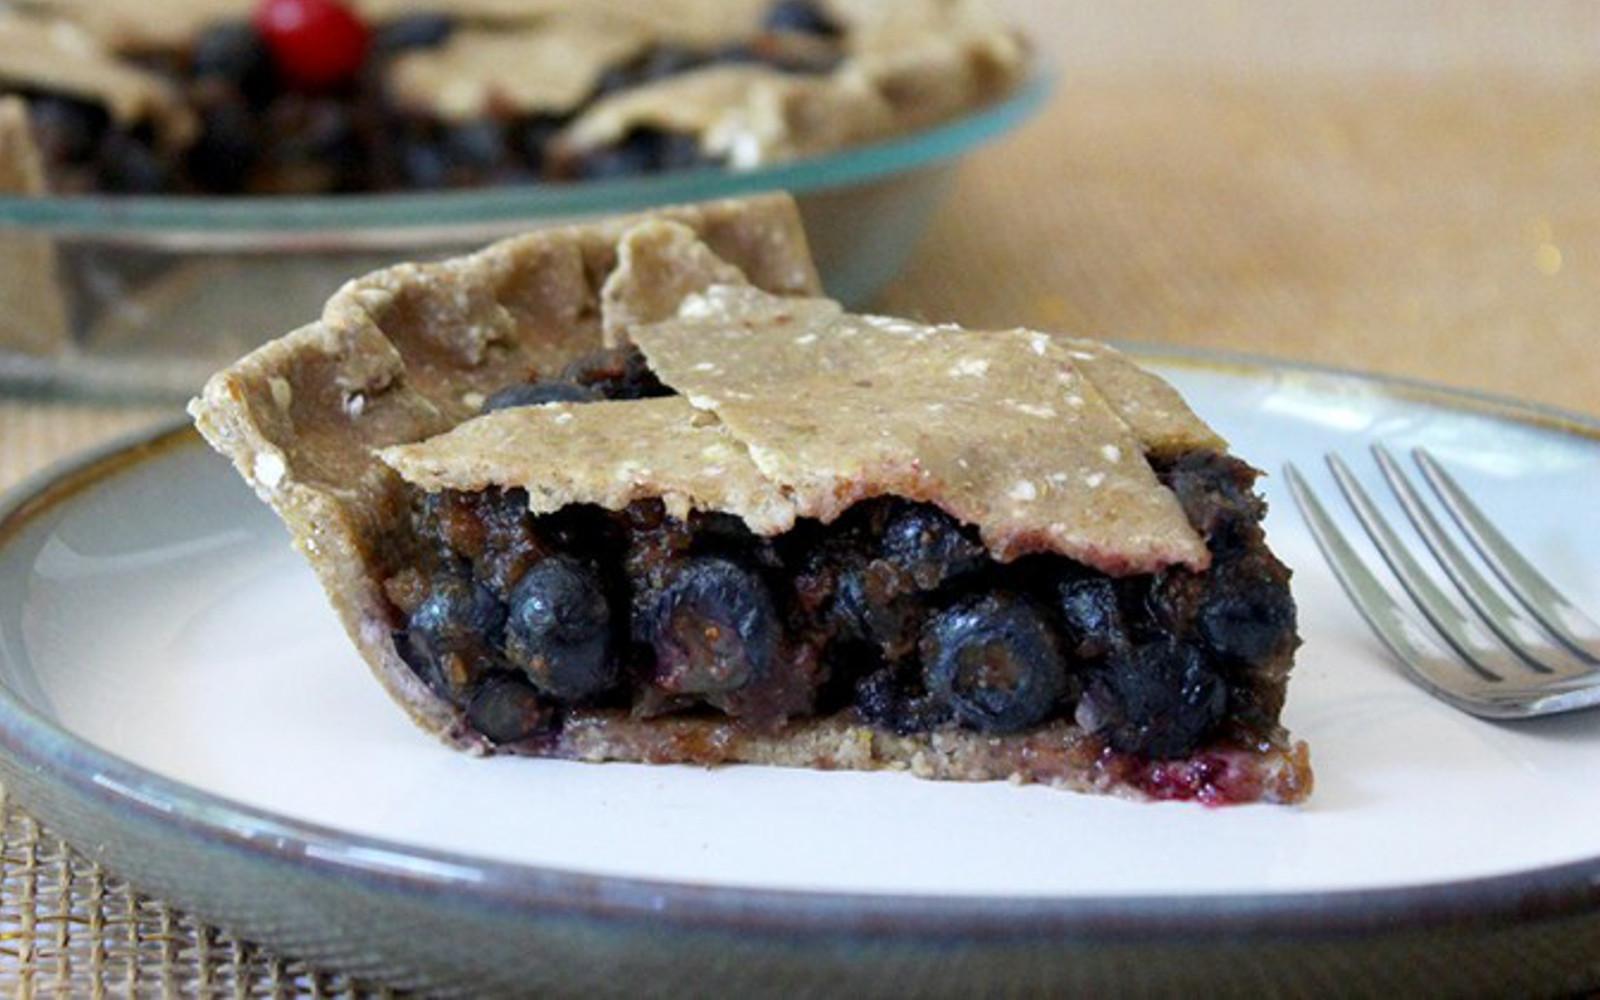 Vegan Raw Blueberry Pie